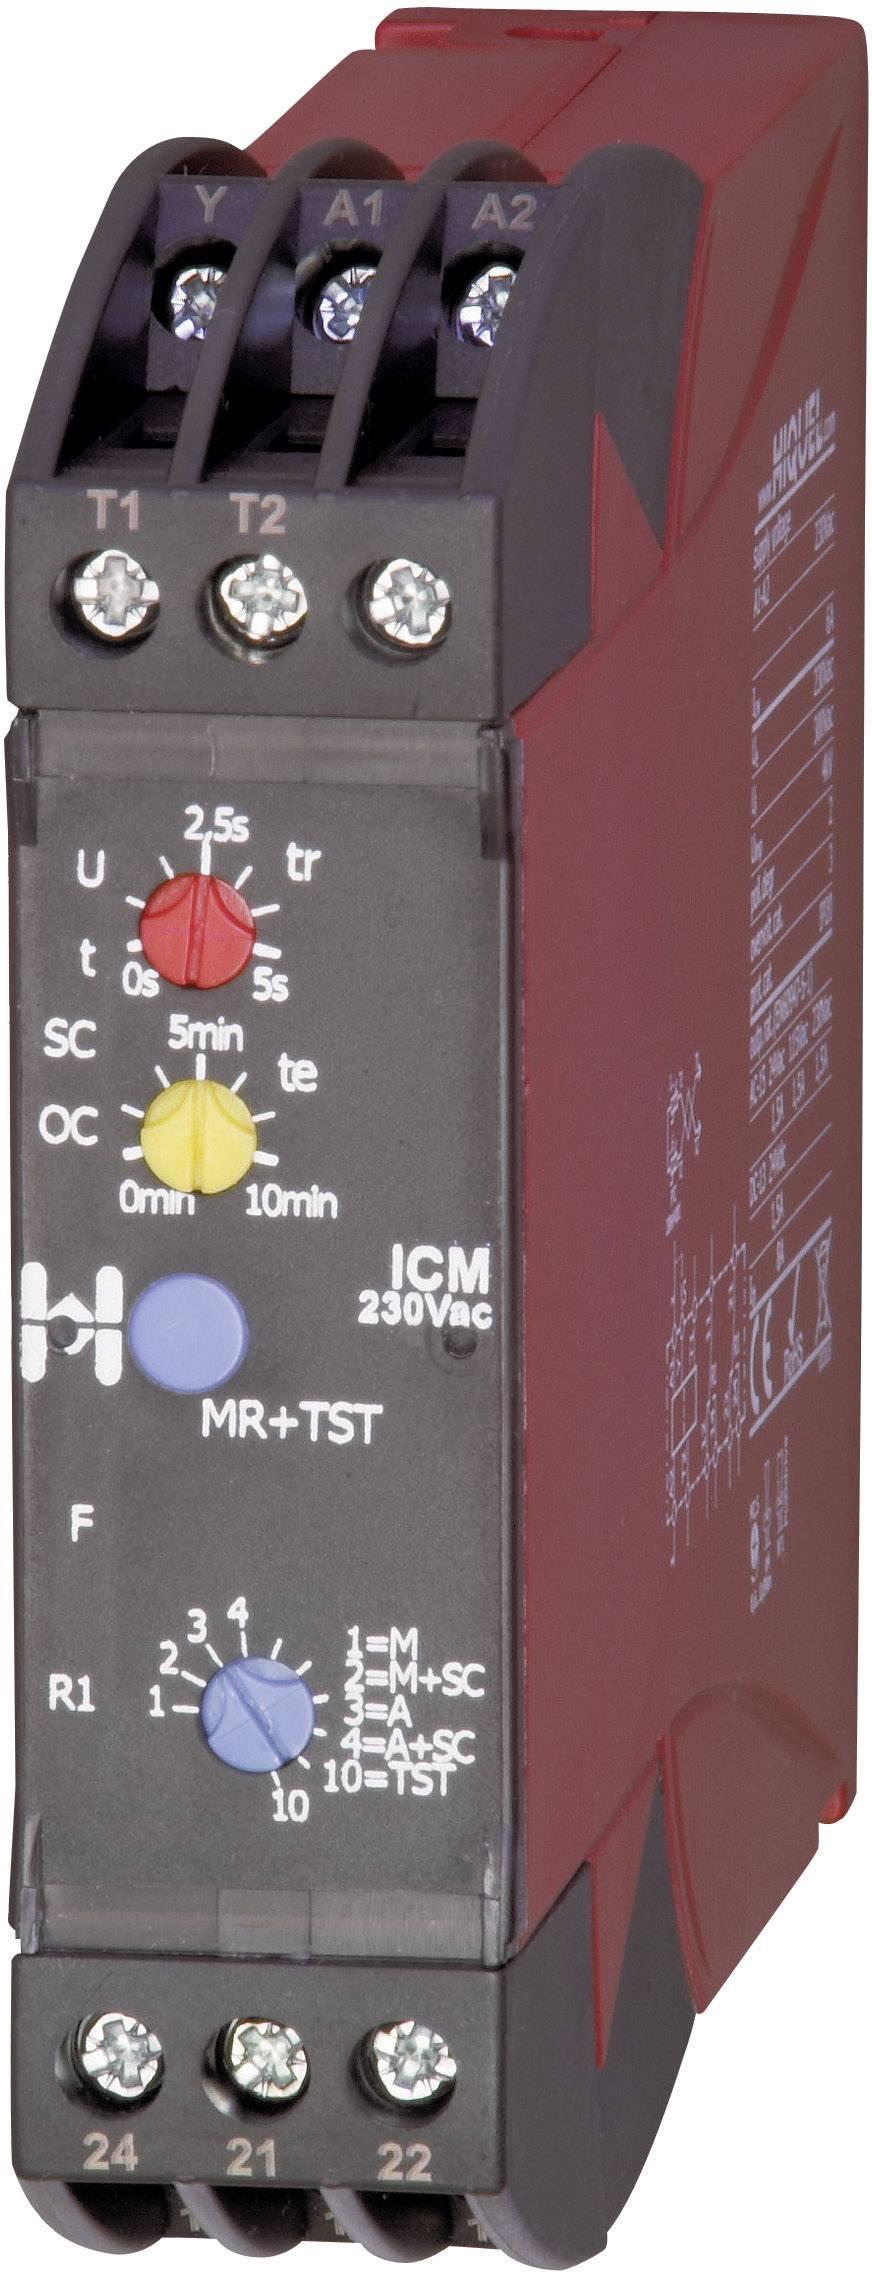 Monitorovací relé in-case Hiquel, ICM 230Vac, in-case